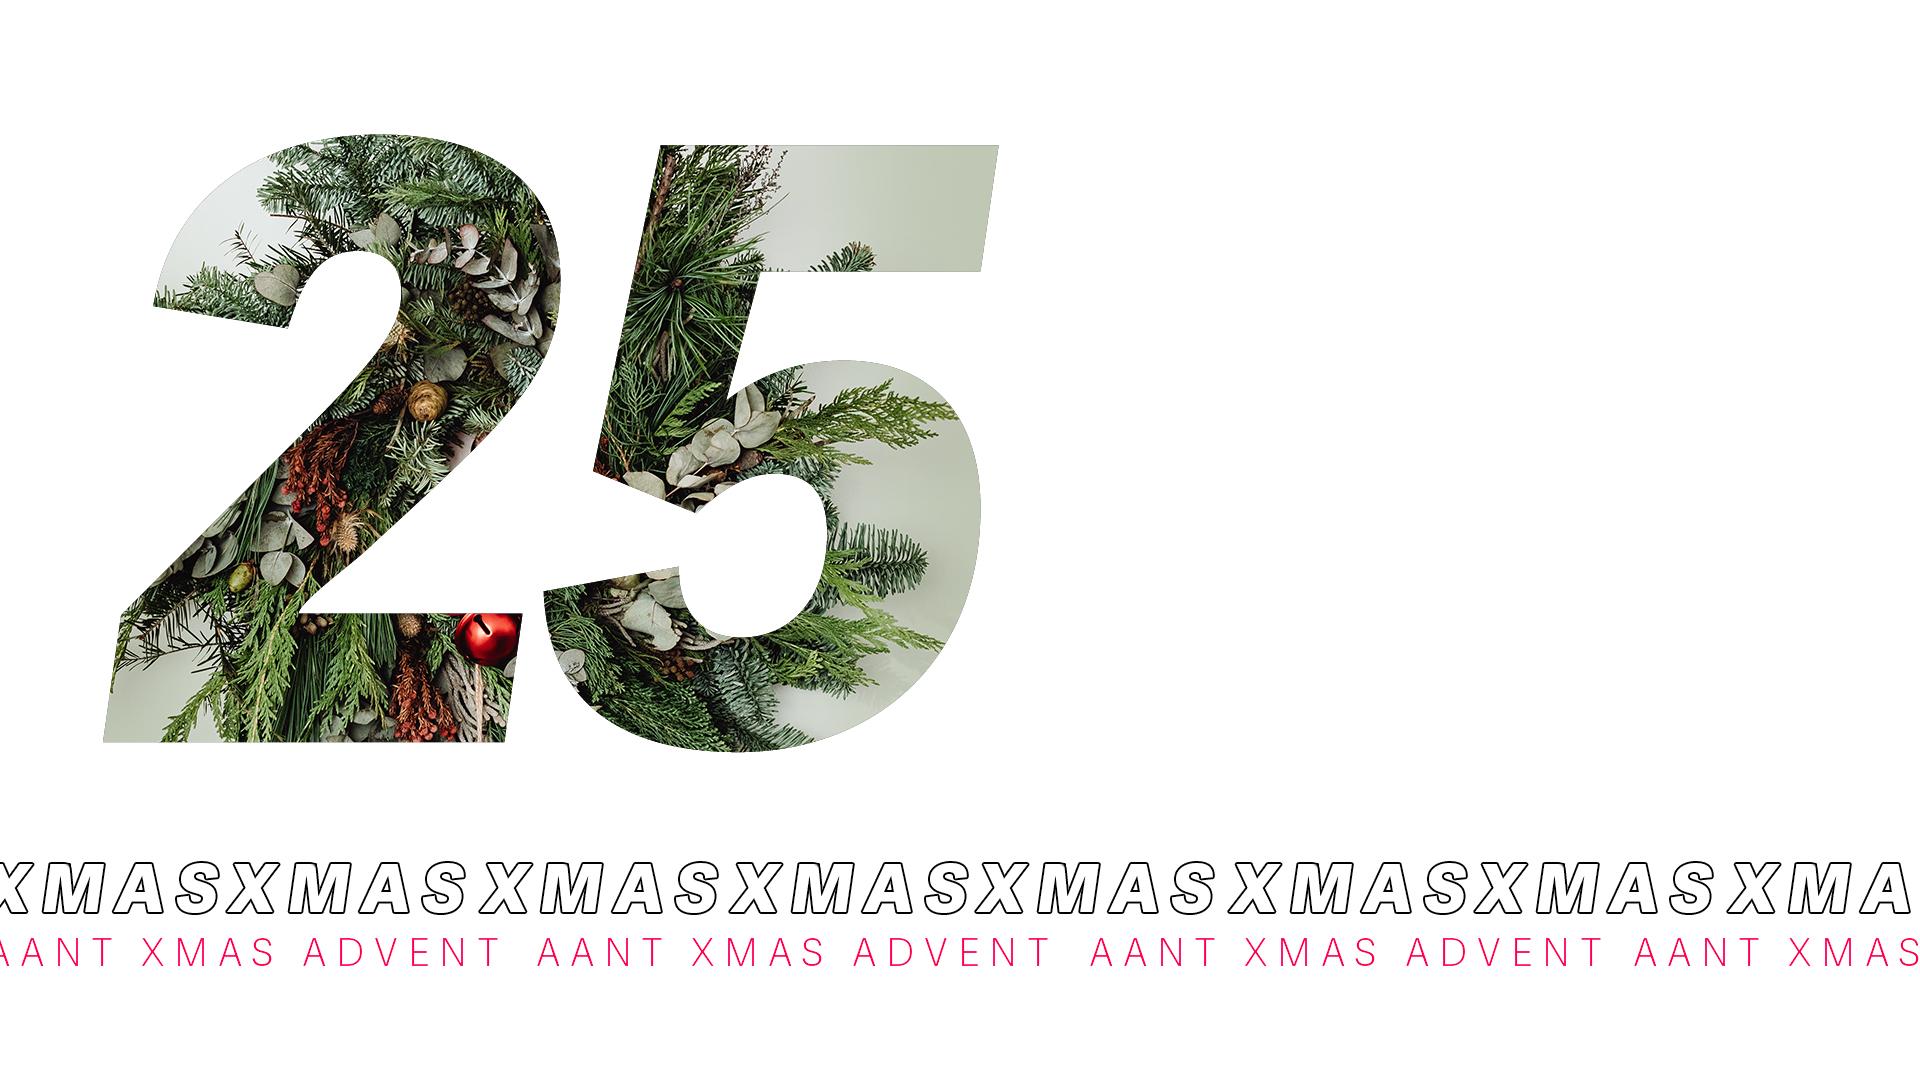 AANT XMAS ADVENT – 25 DICEMBRE